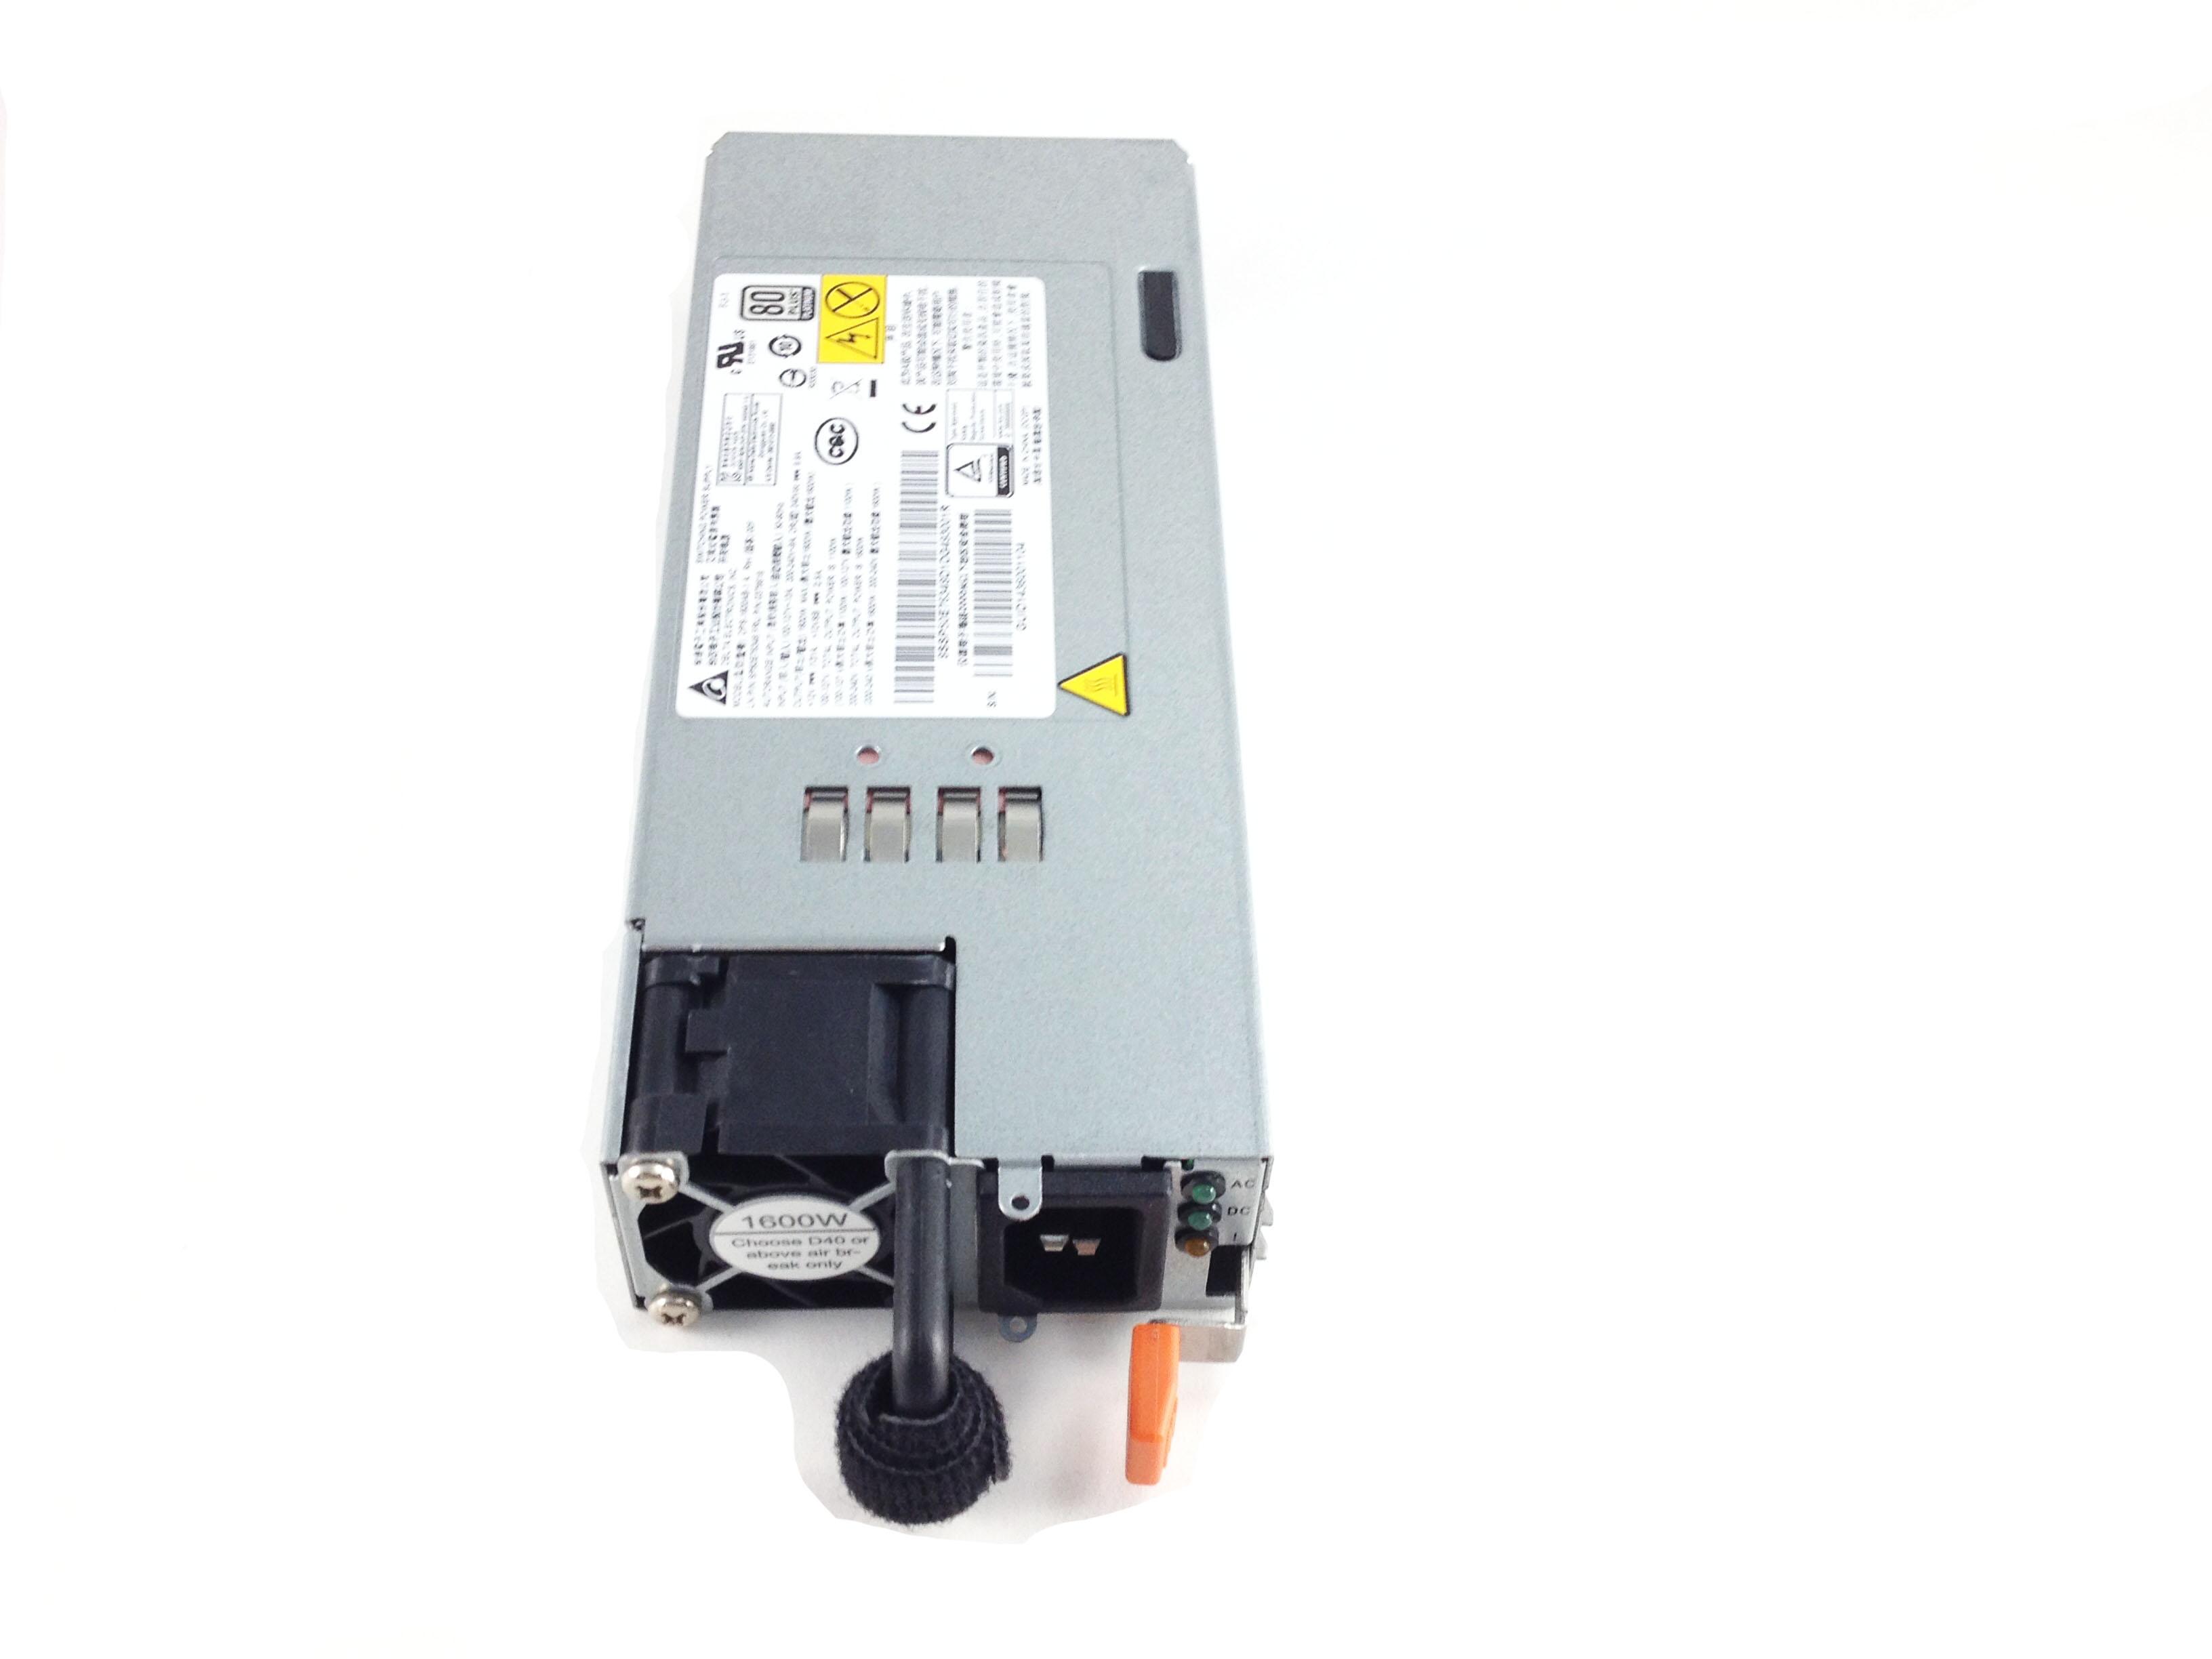 Lenovo ThinkServer Rd550 RD650 1600W Hot Swap Power Supply (03T8619)